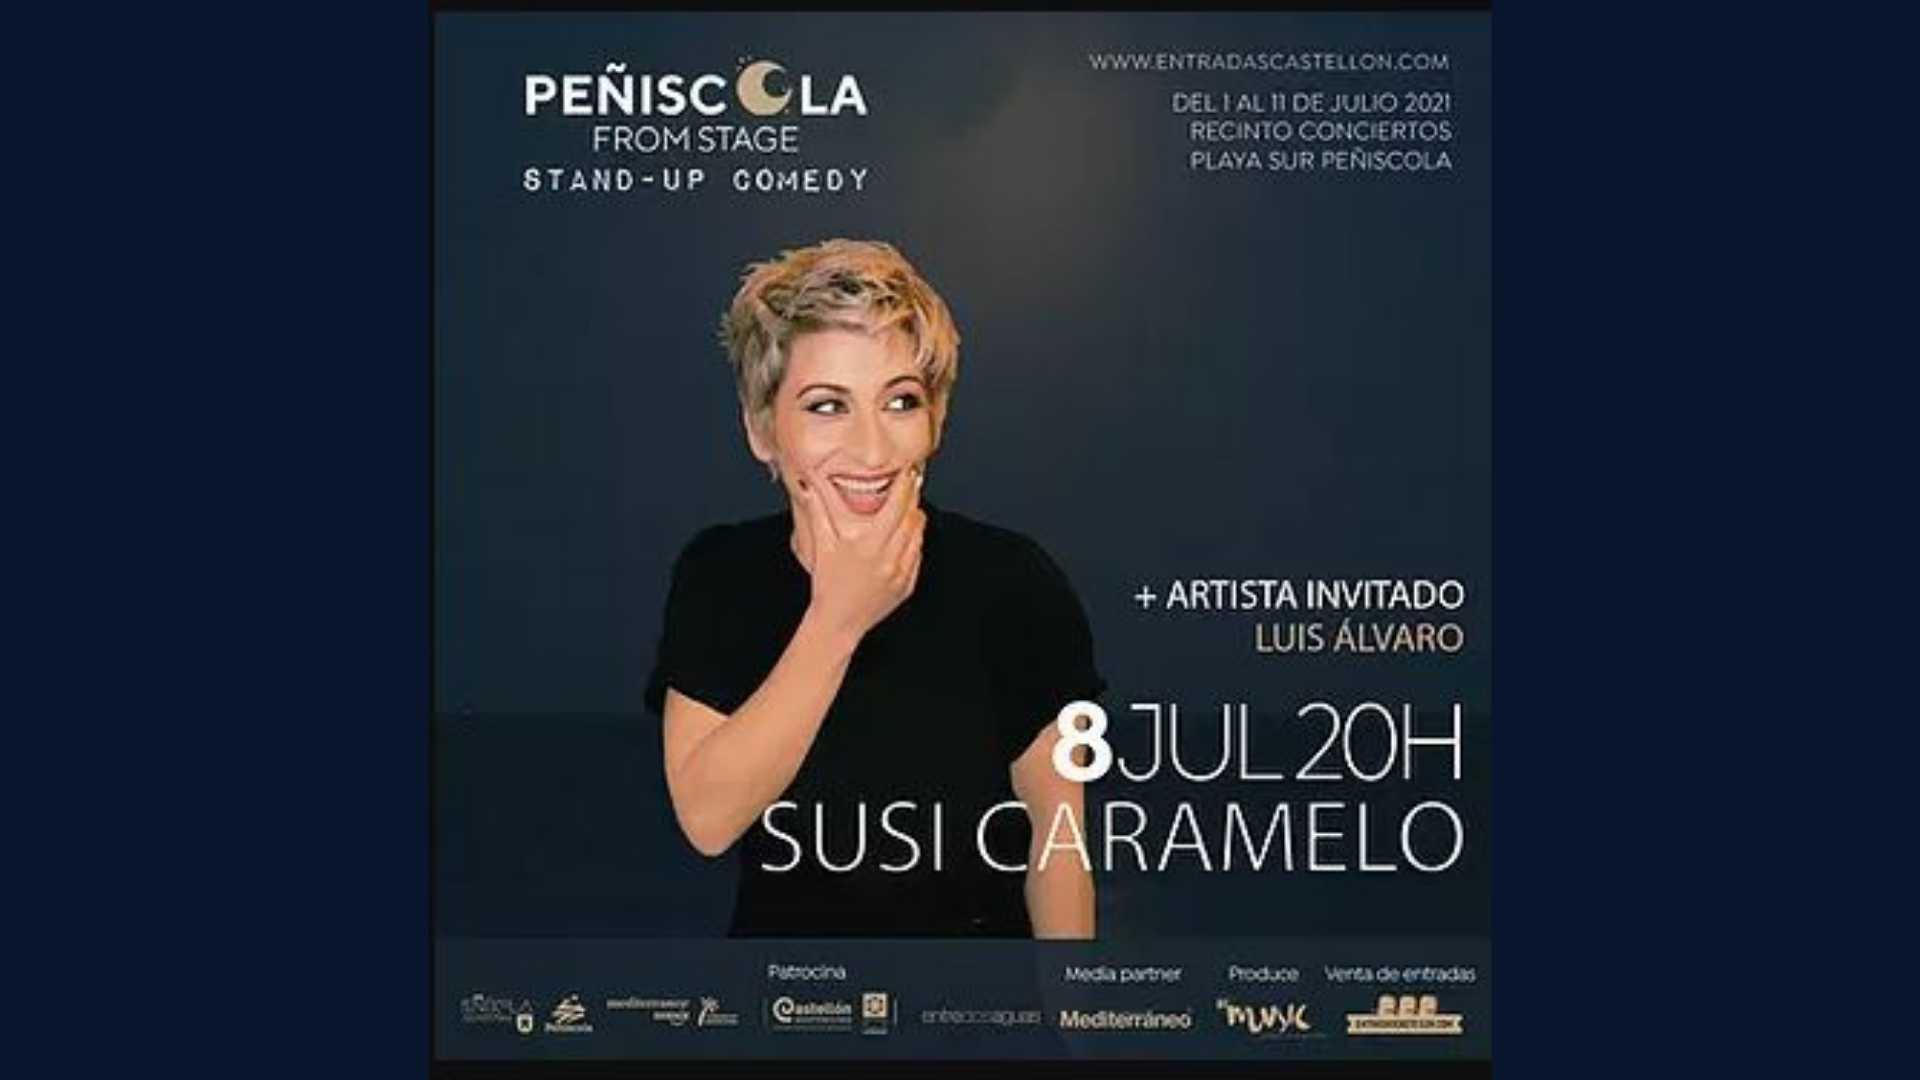 festival form stage peñiscola